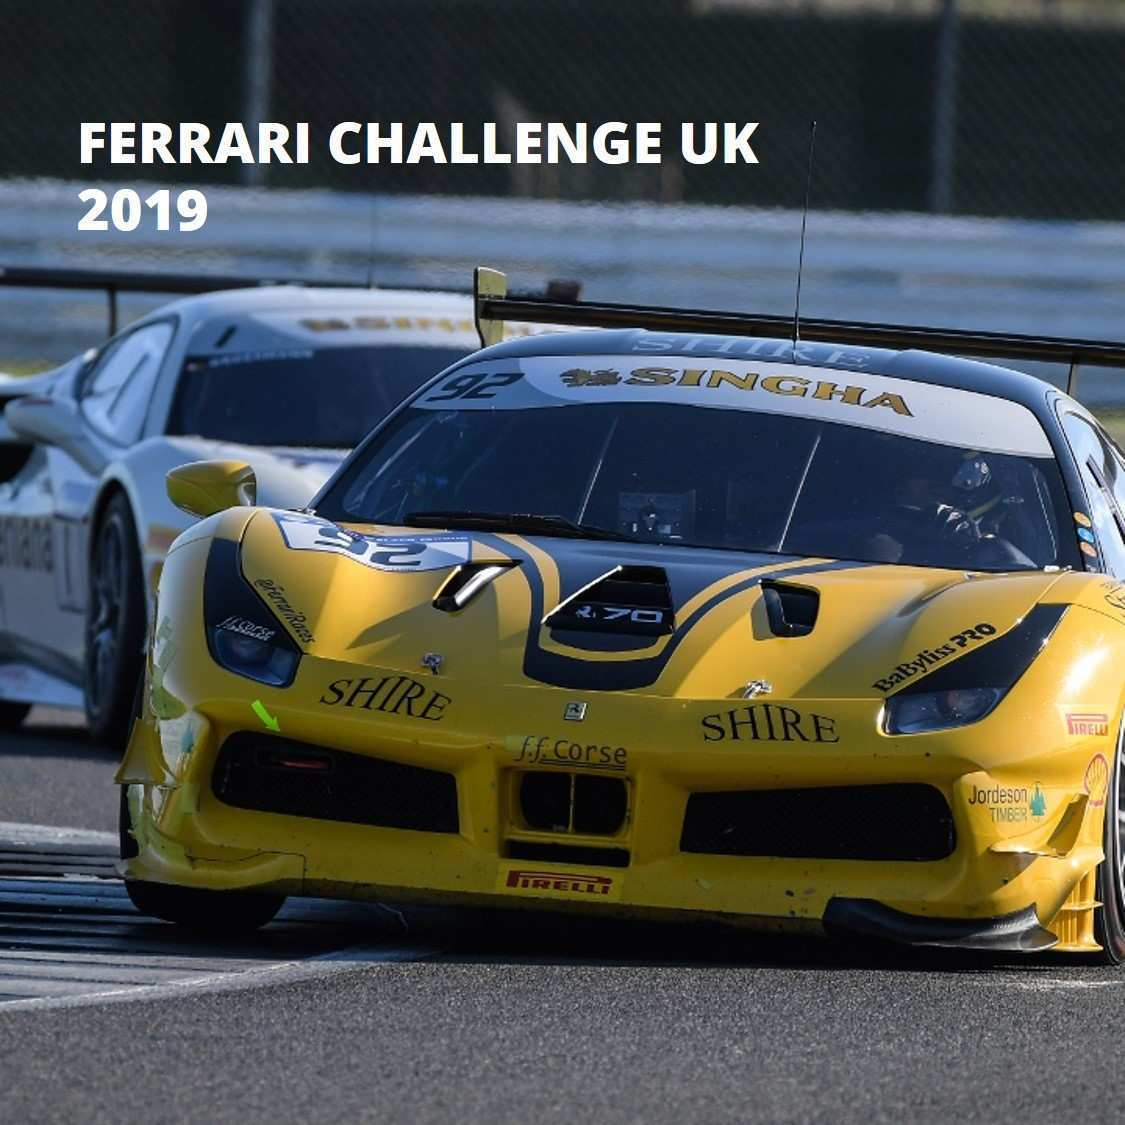 19 All New New Ferrari Challenge 2019 Calendar Price Performance and New Engine for New Ferrari Challenge 2019 Calendar Price